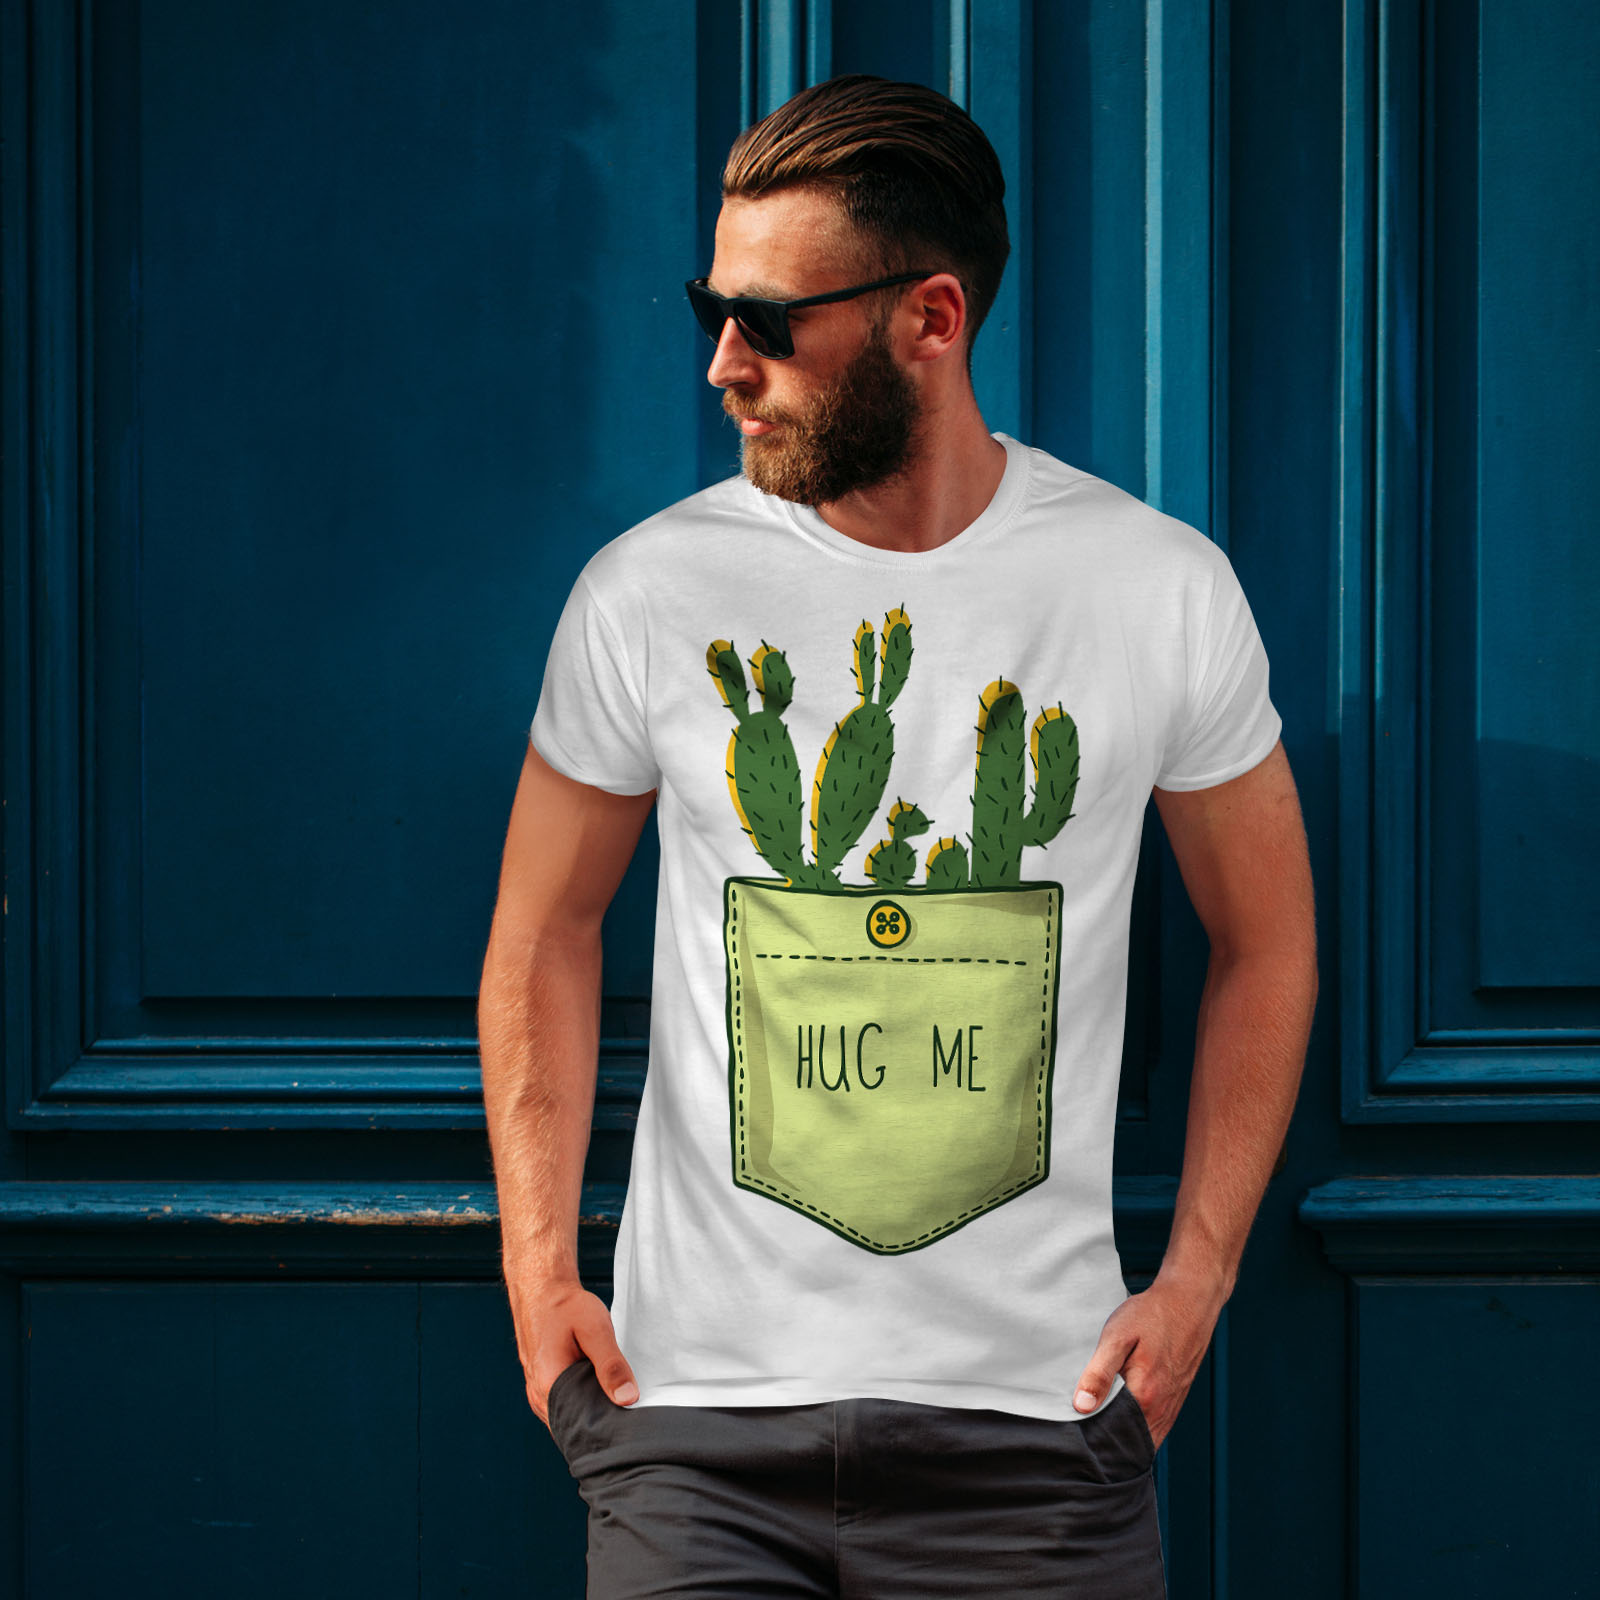 miniature 10 - Wellcoda Hug Me Cactus Funny Mens T-shirt,  Graphic Design Printed Tee